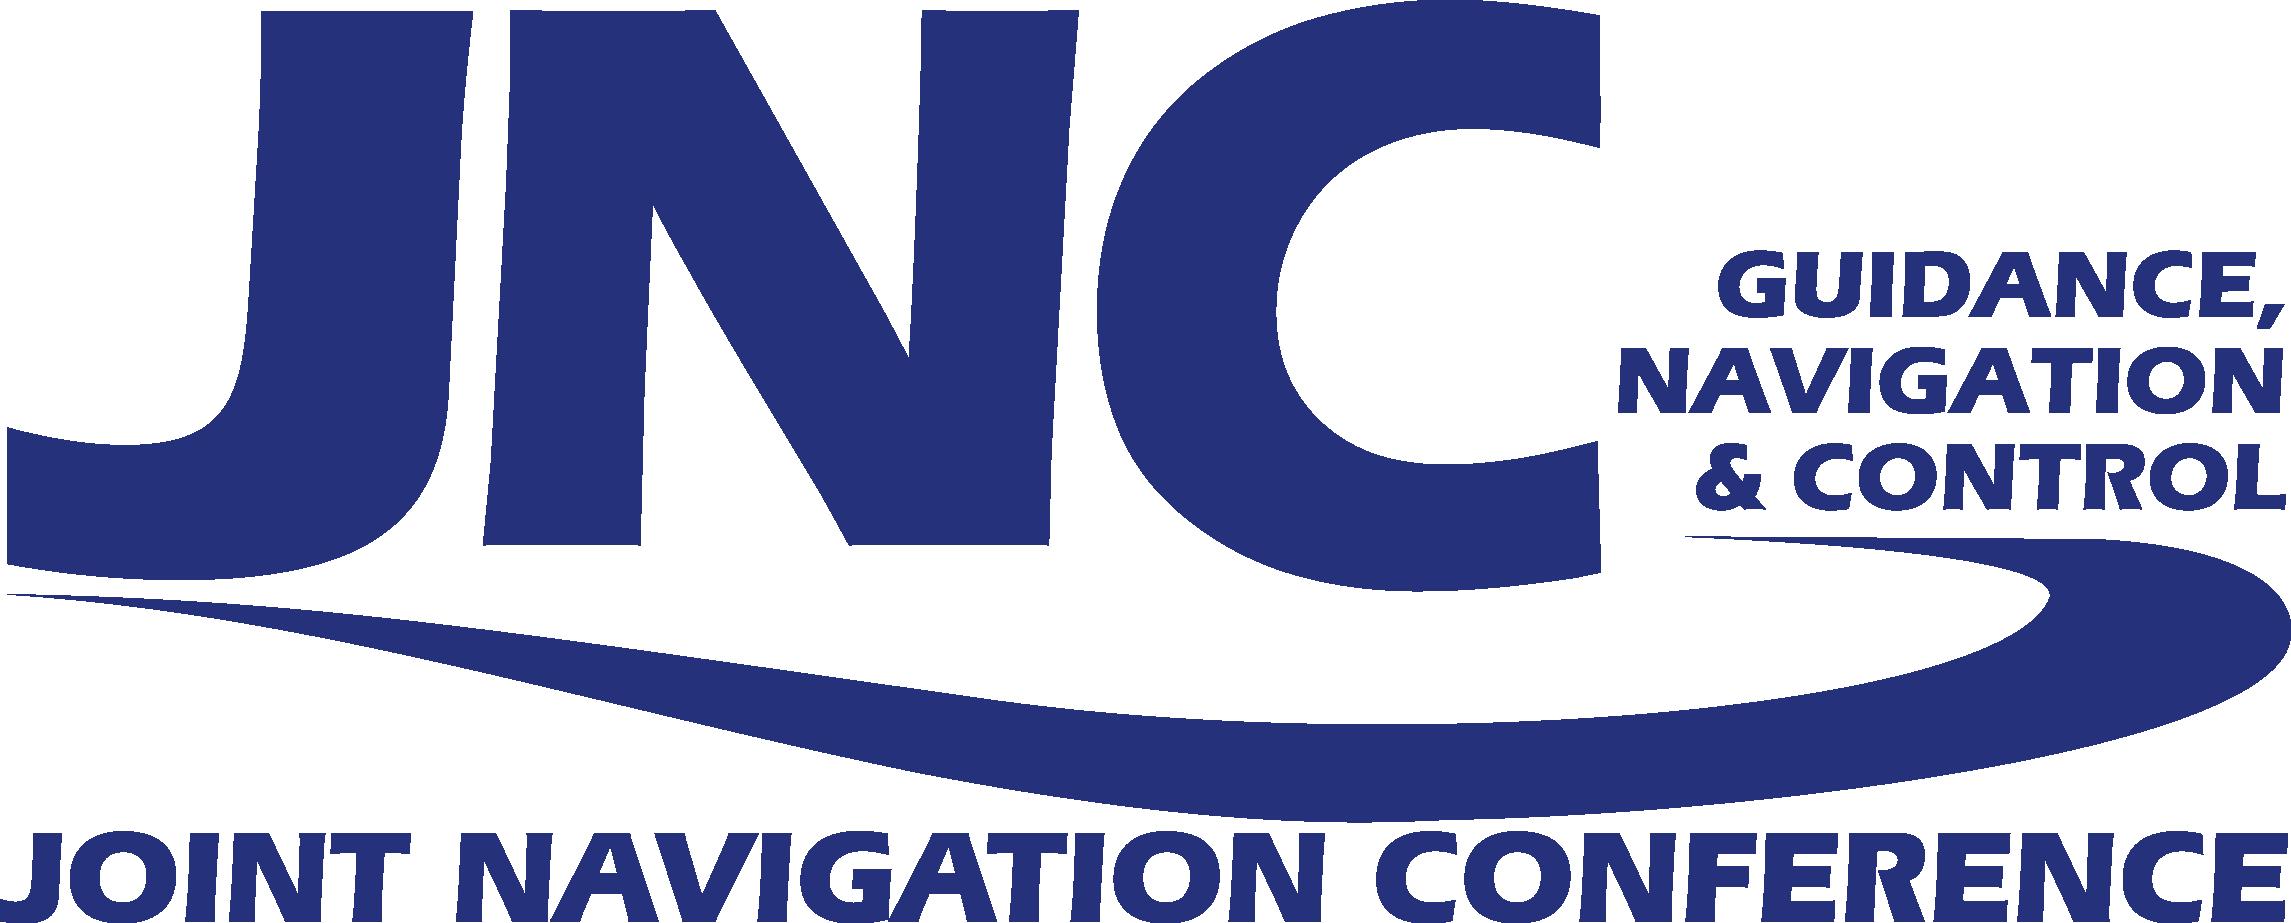 joint navigation conference joint navigation conference